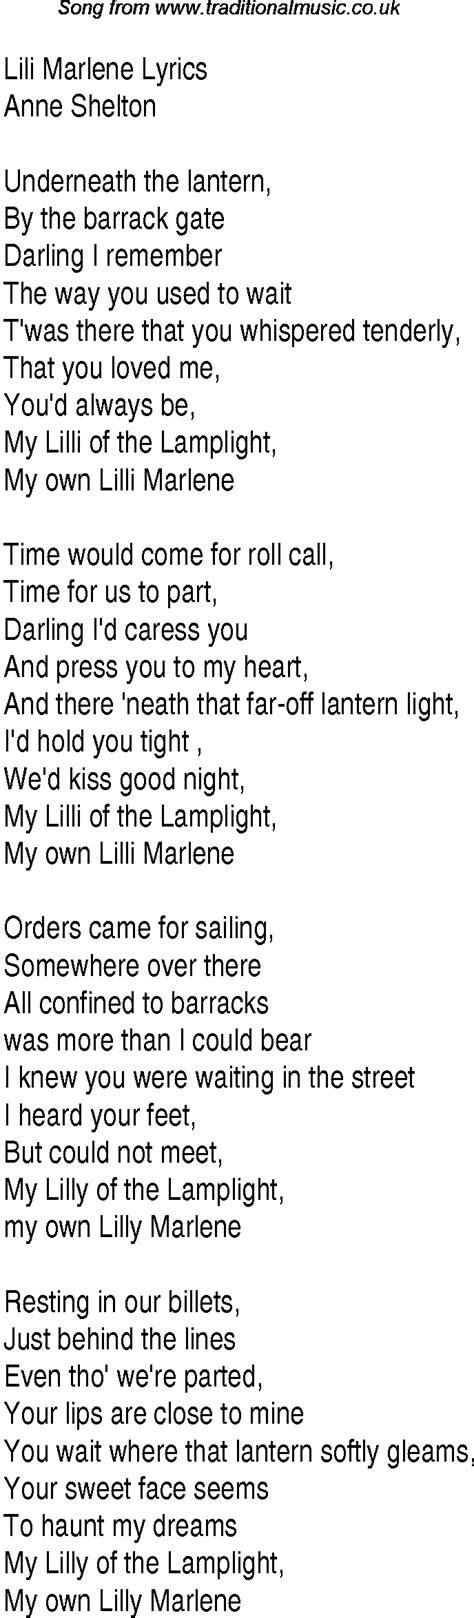 lilly testo 1940s top songs lyrics for lili marlene shelton